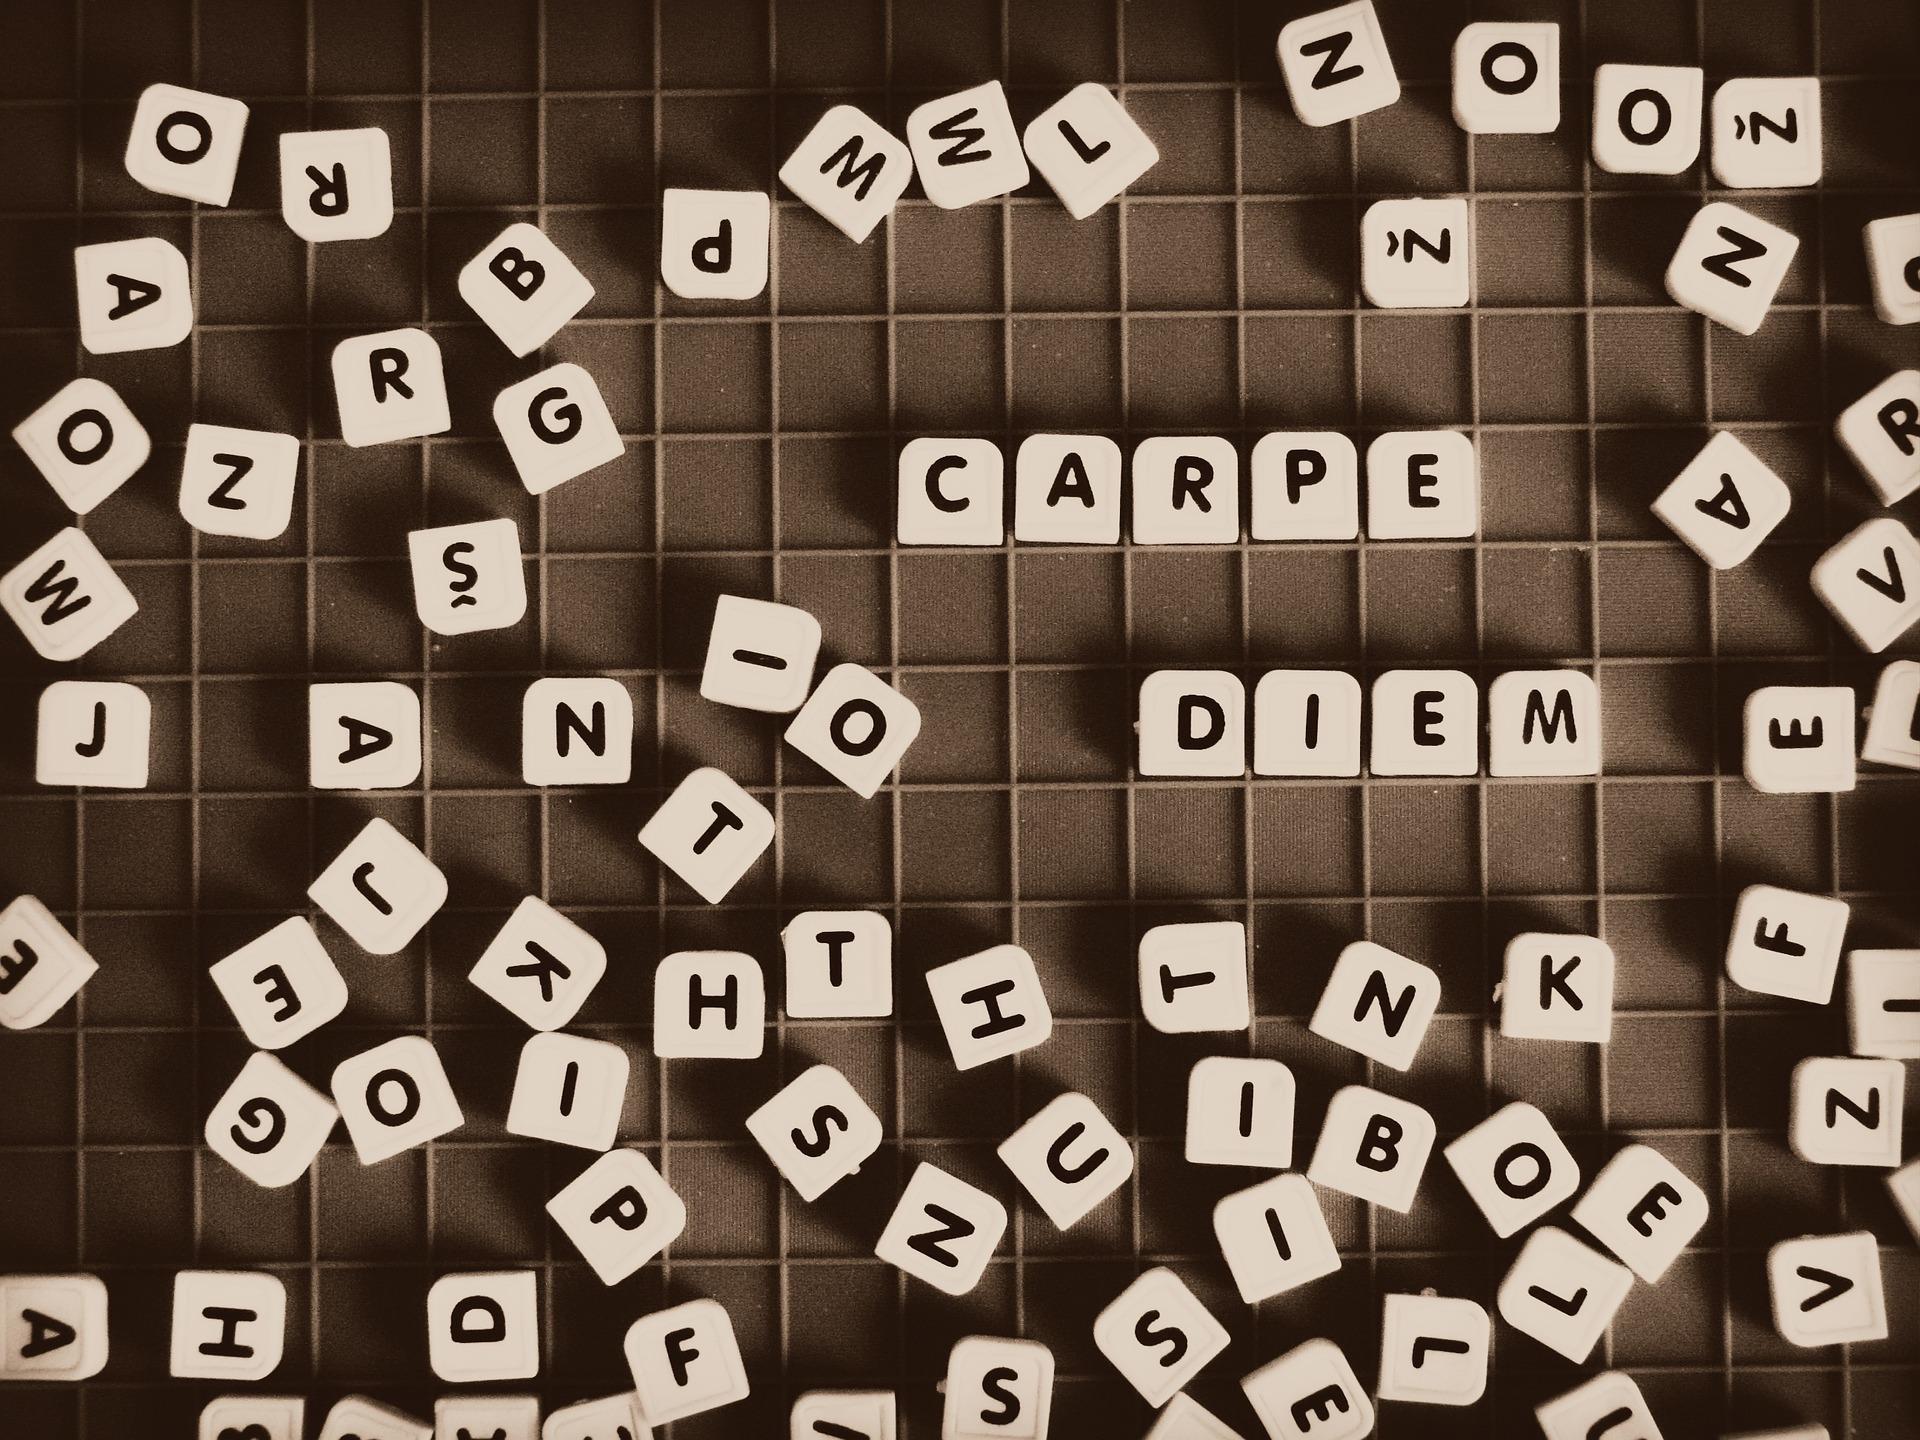 Parole, gioco, incontri, testi, vita - Sfondi HD - Professor-falken.com